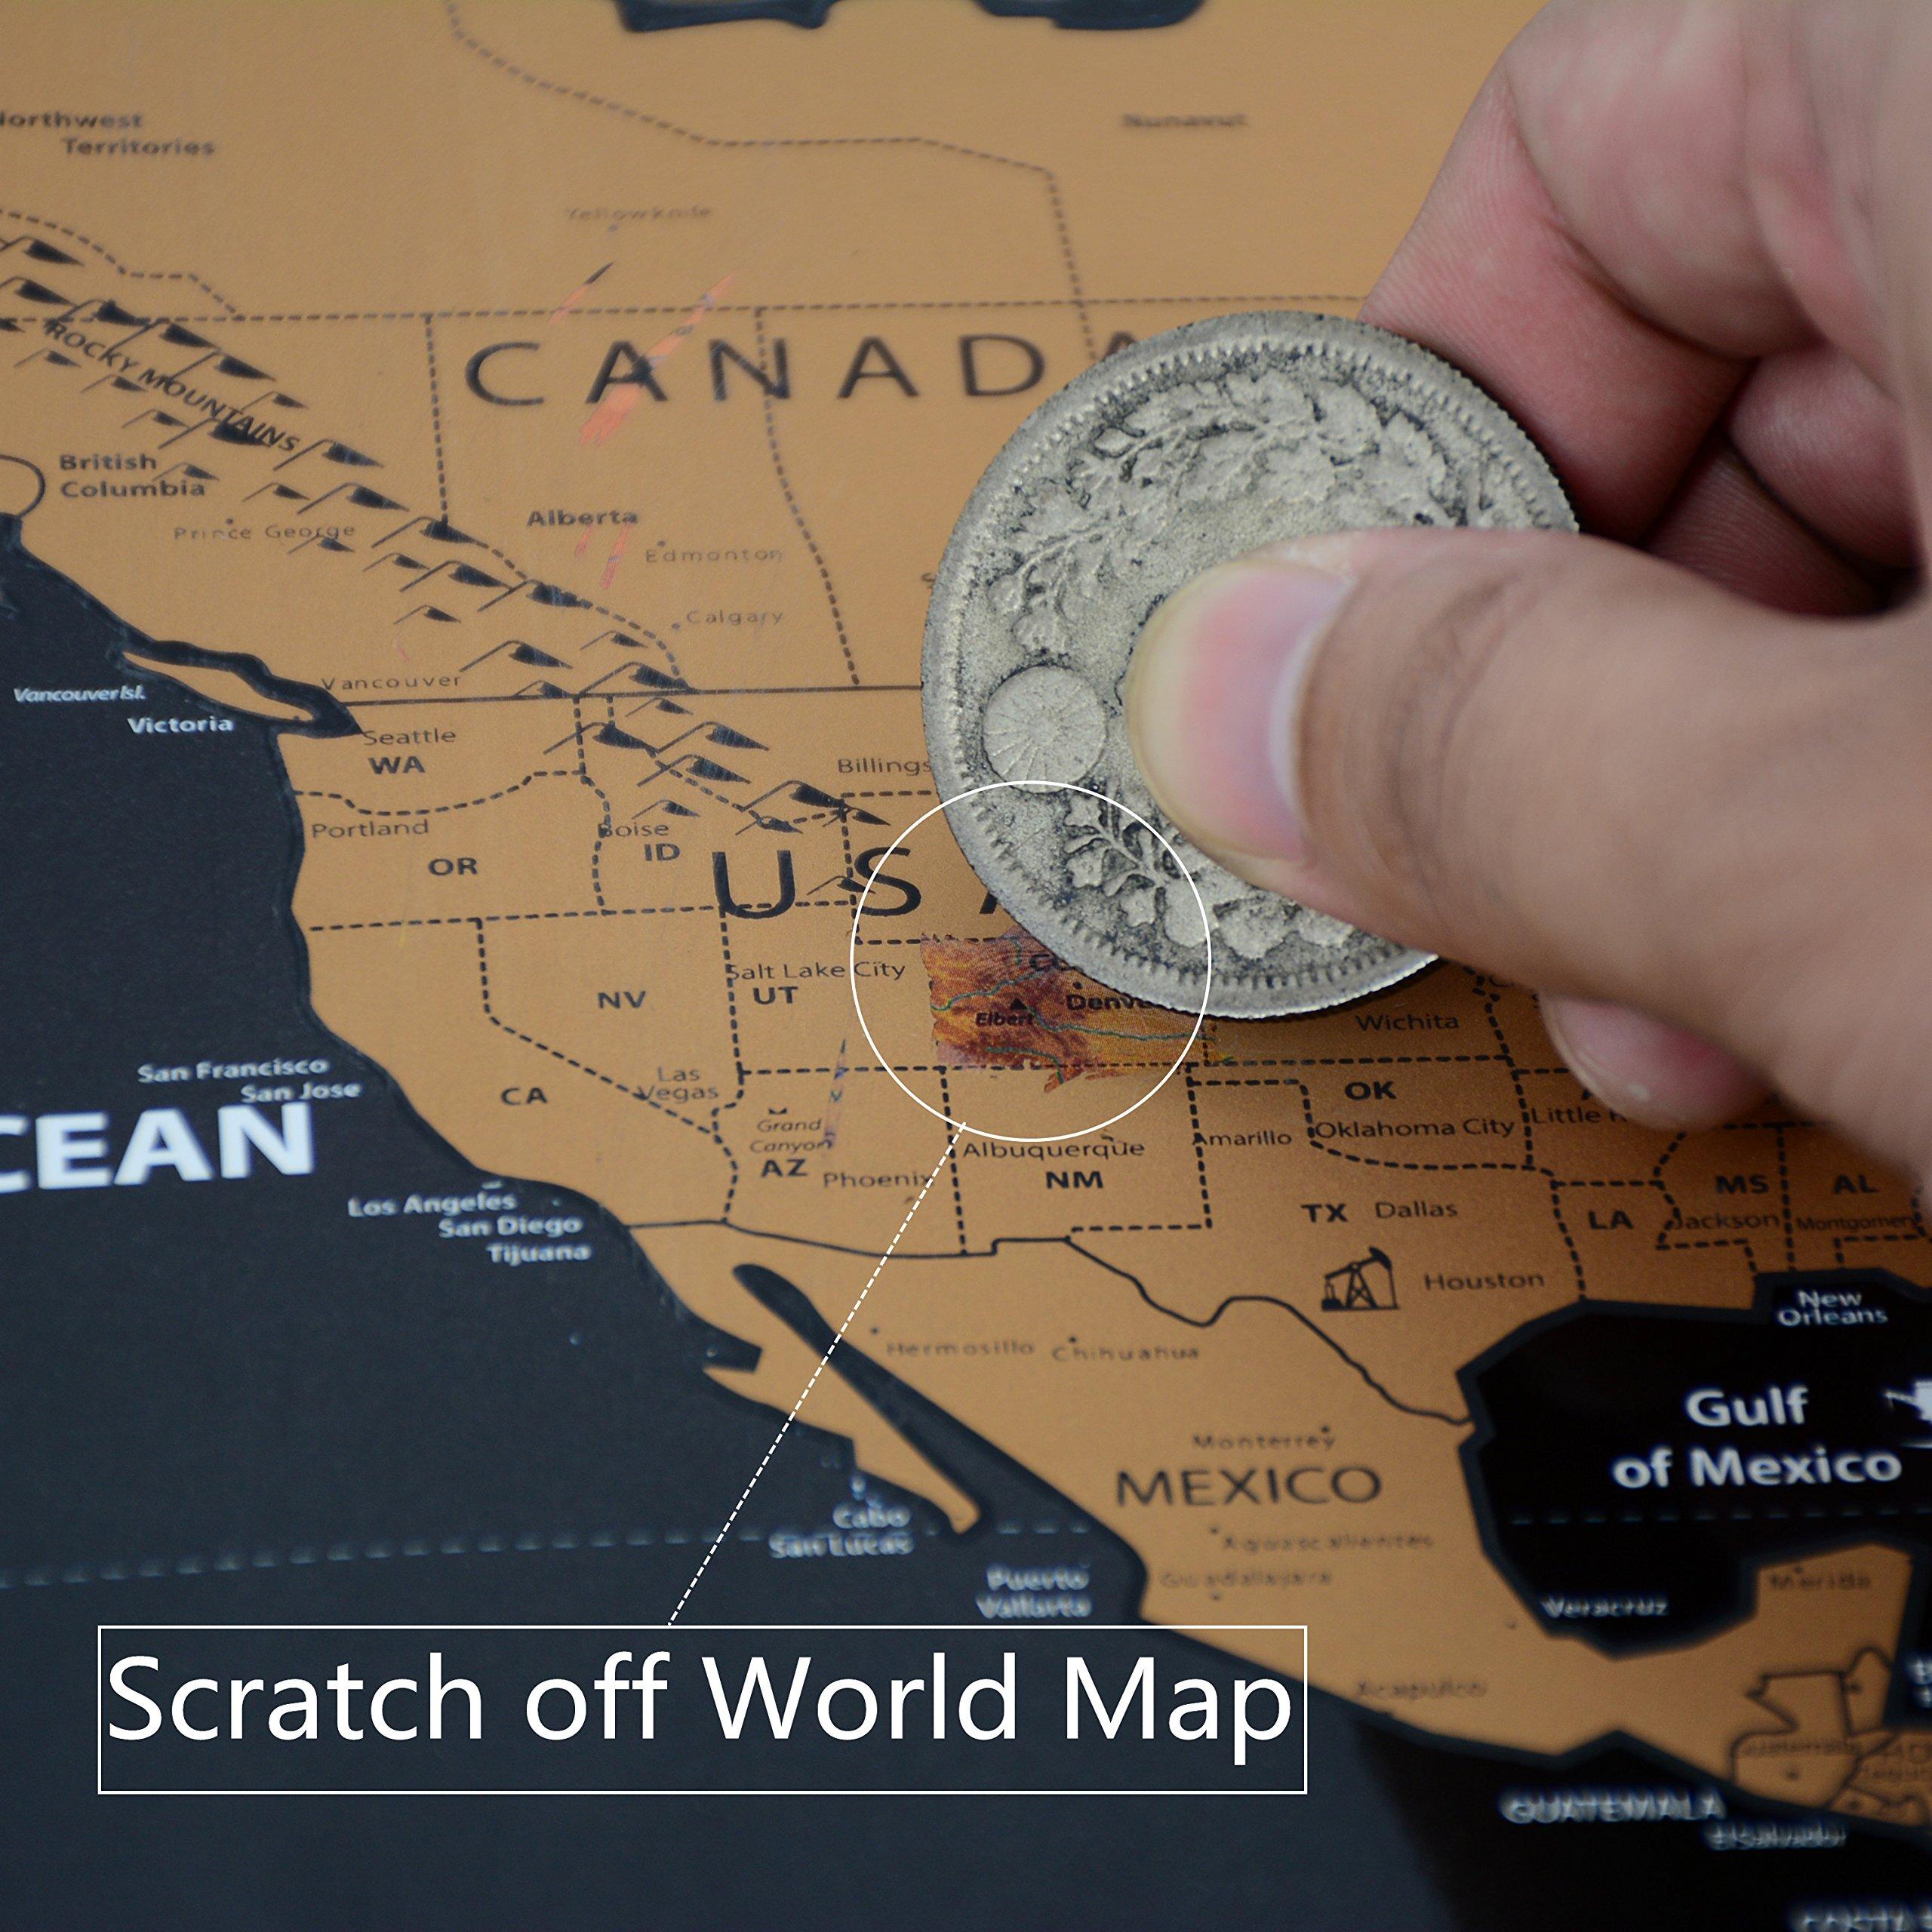 325 x 234 scratch off the world map cnsunway lighting travel map poster black scratch off the world map